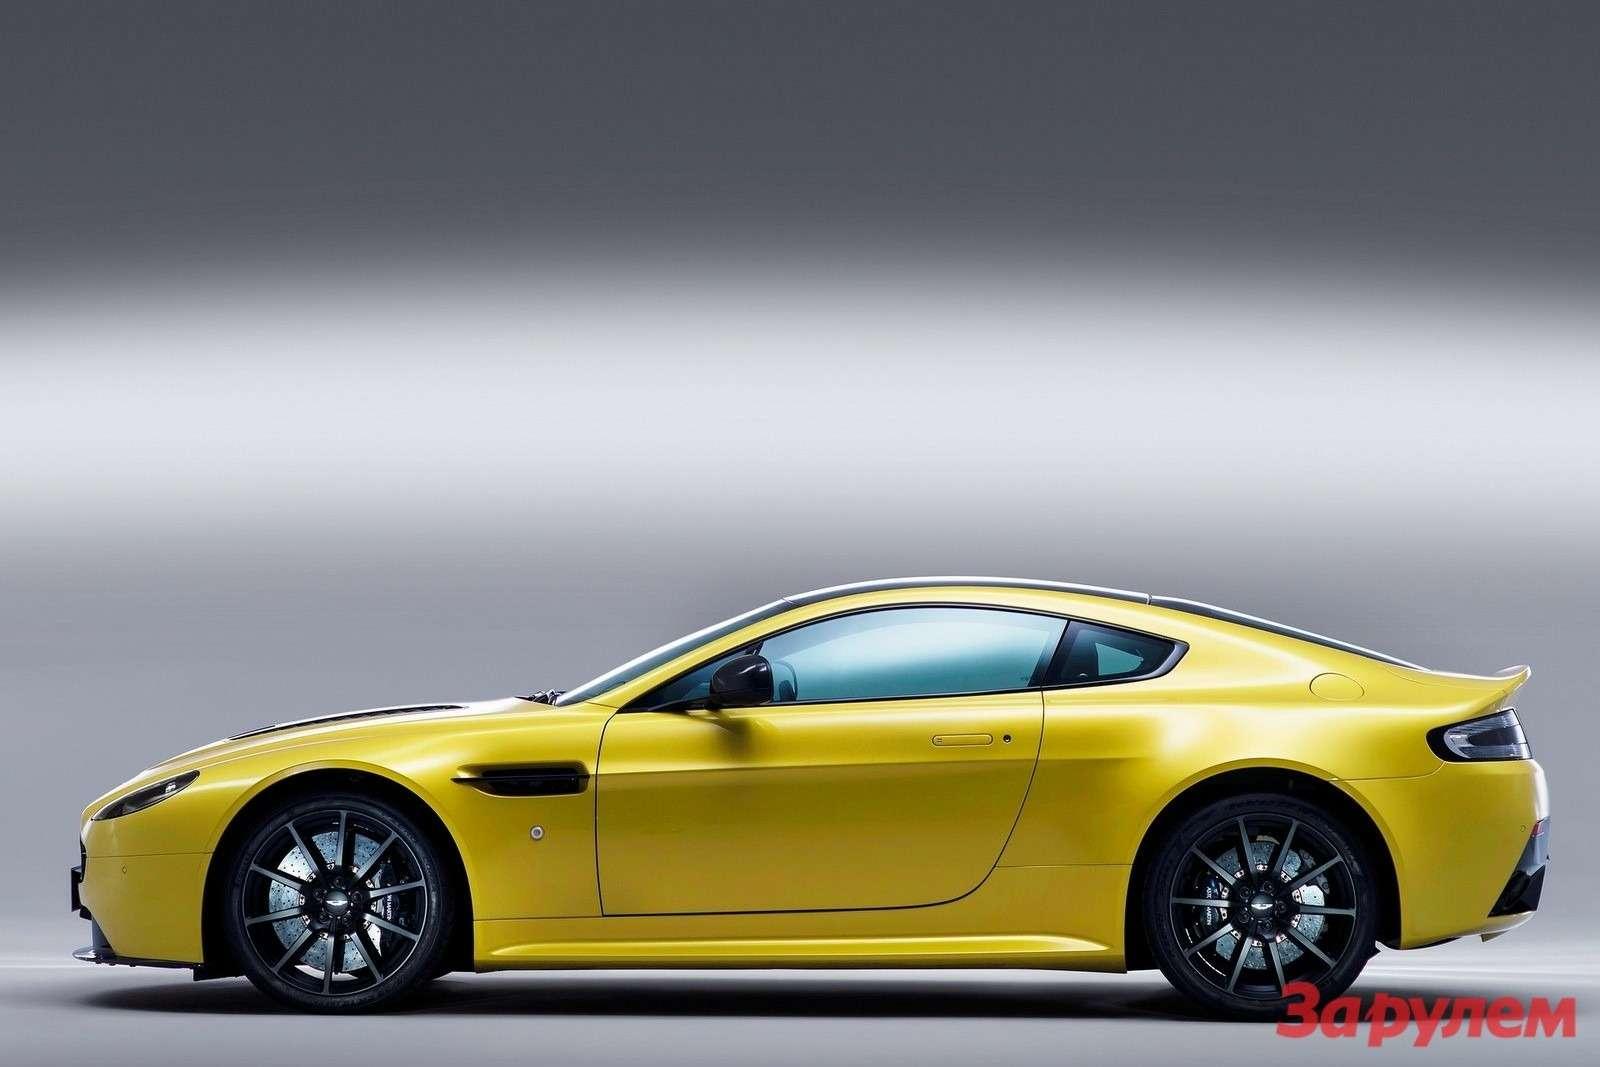 Aston Martin V12 Vantage S2014 1600x1200 wallpaper 0c